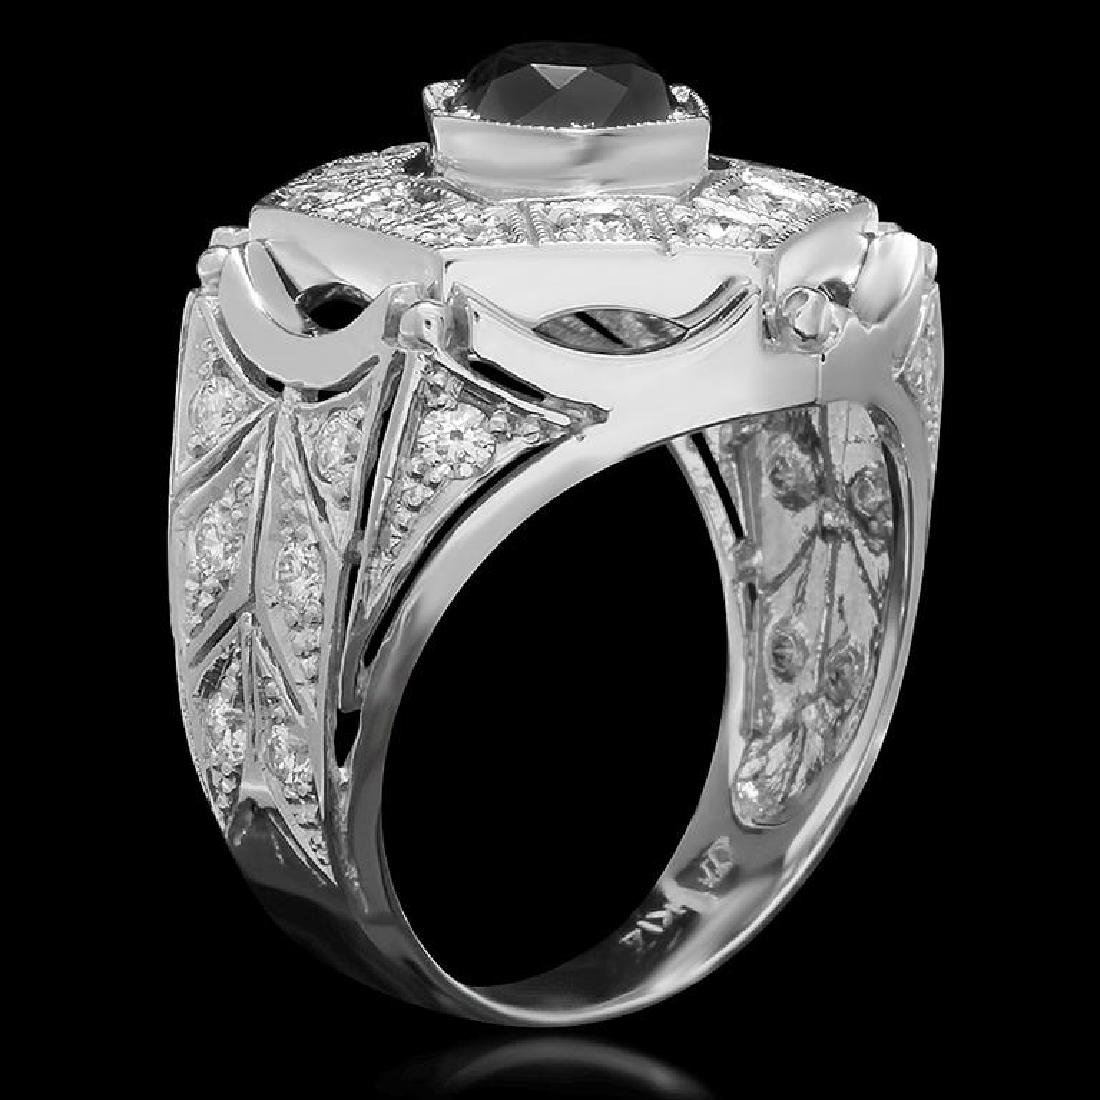 14K Gold 1.95ct Fancy Color Diamond 3.25ct Diamond Ring - 2